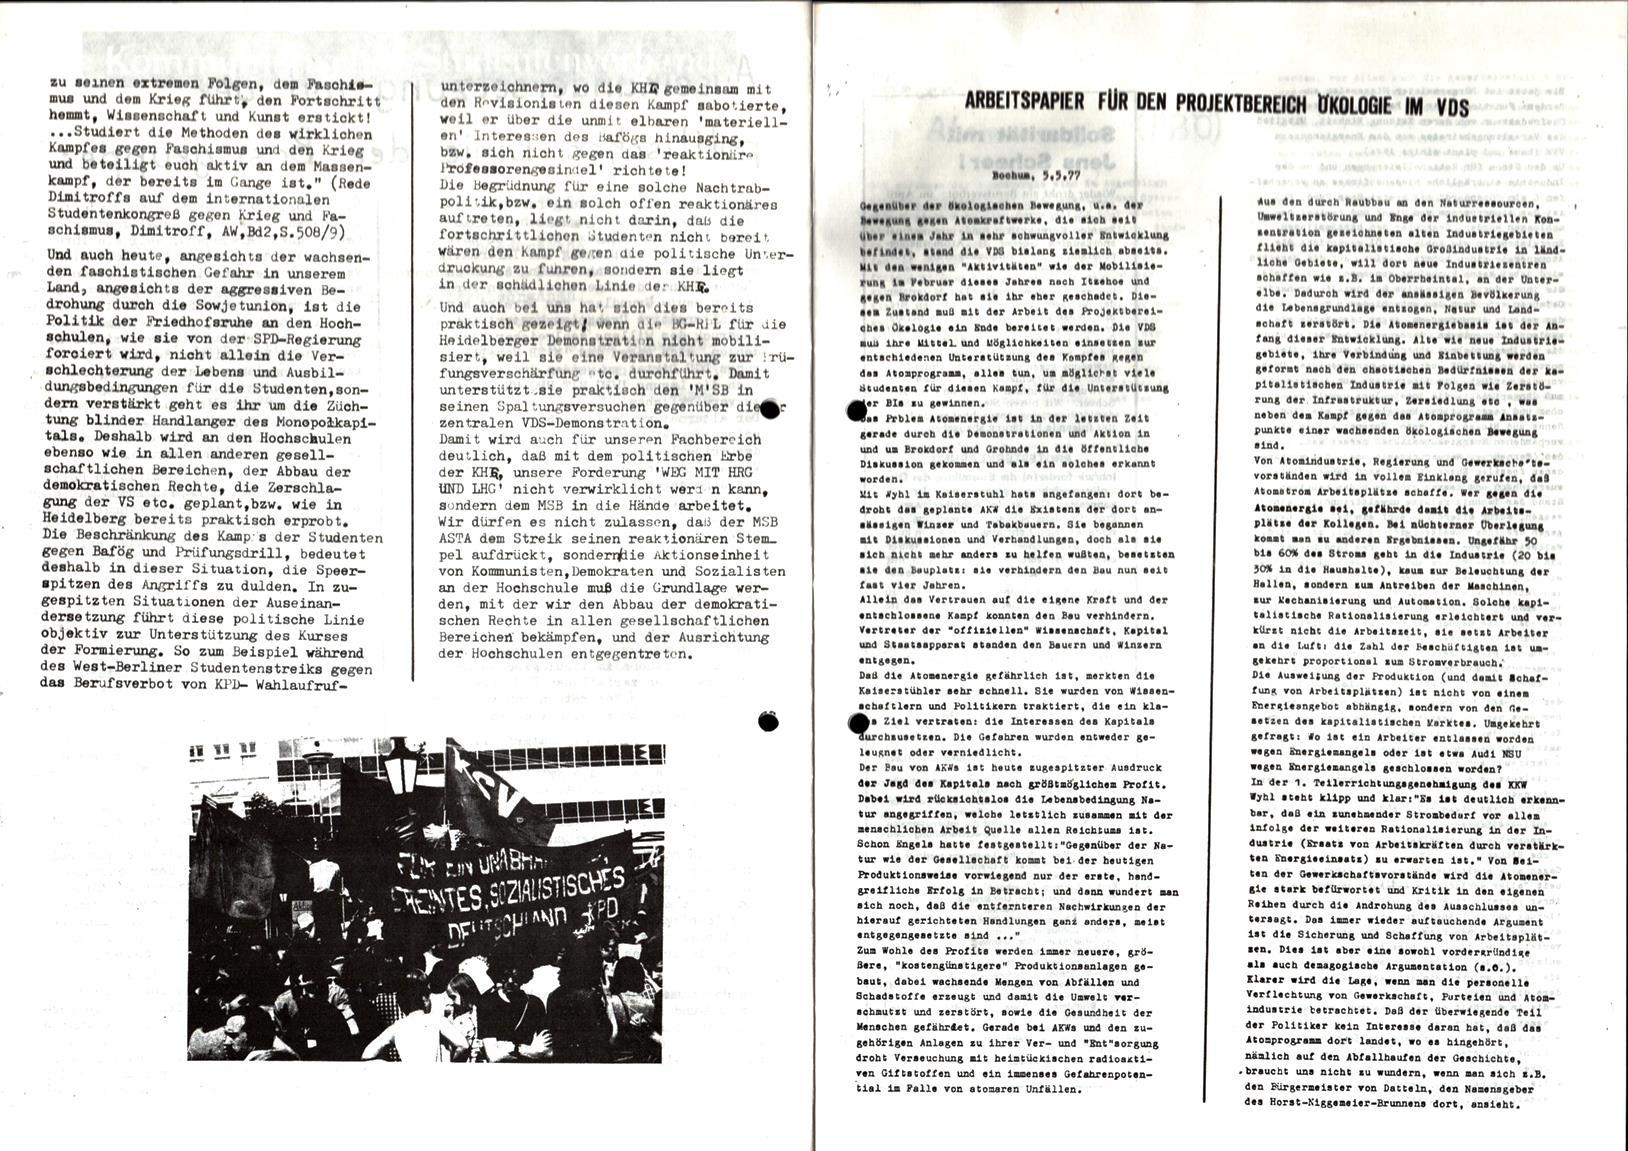 Dortmund_KSV_Studentenpresse_Uni_1977_05_17_005